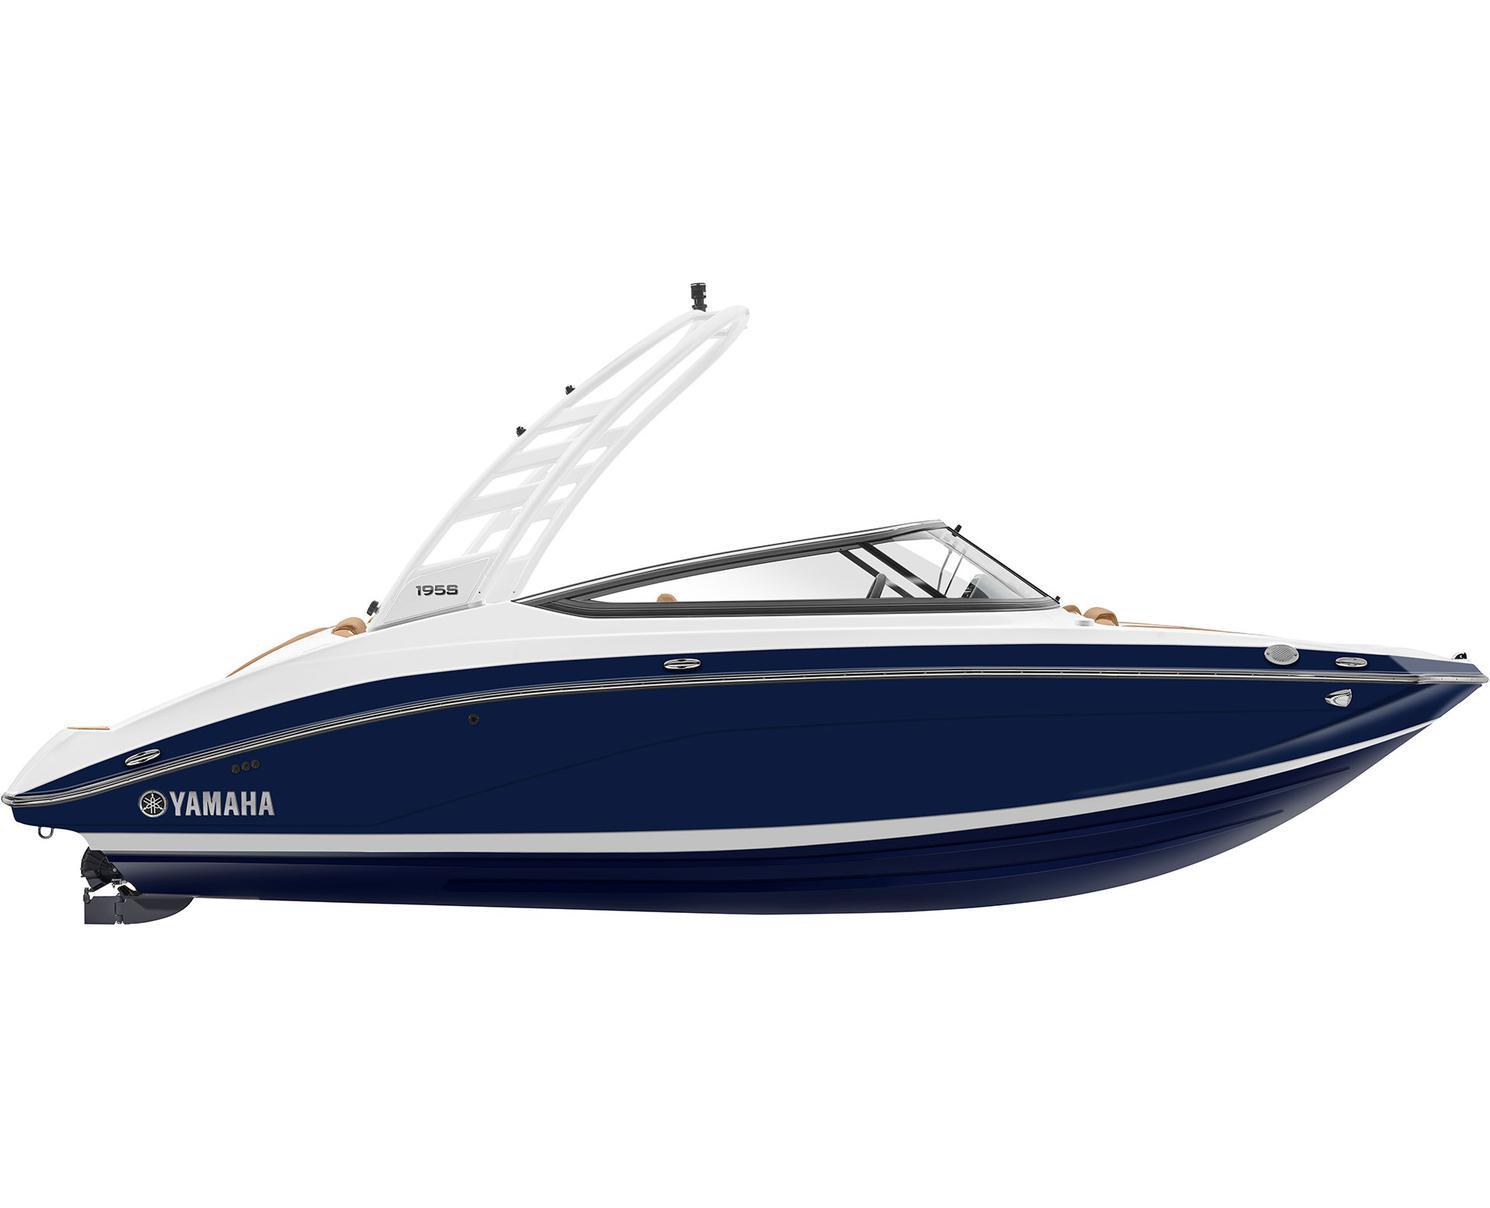 2022 Yamaha 195S Yacht Blue